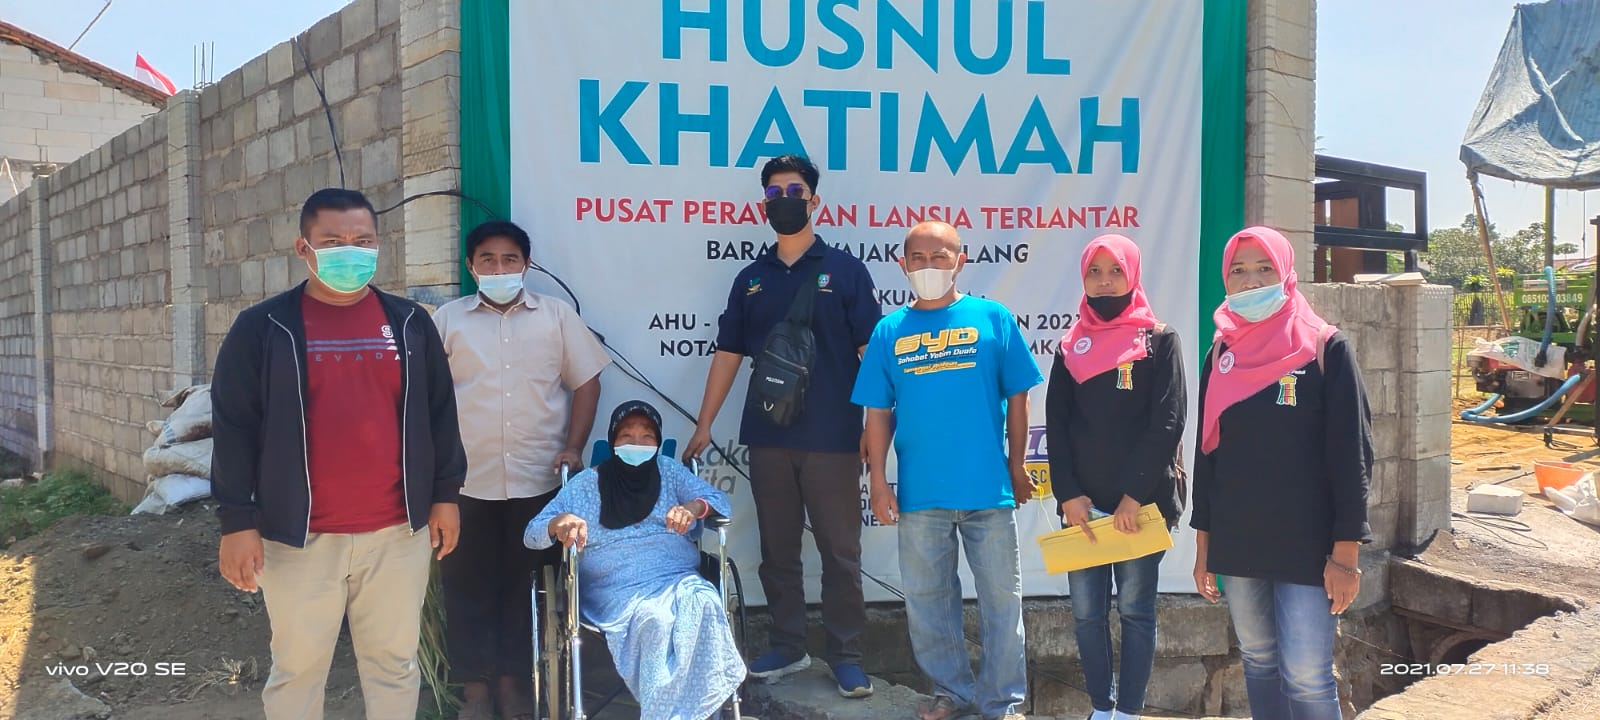 Sinergi dengan KJP, TKSK Jombang Evakuasi Lansia Terlantar ke Malang